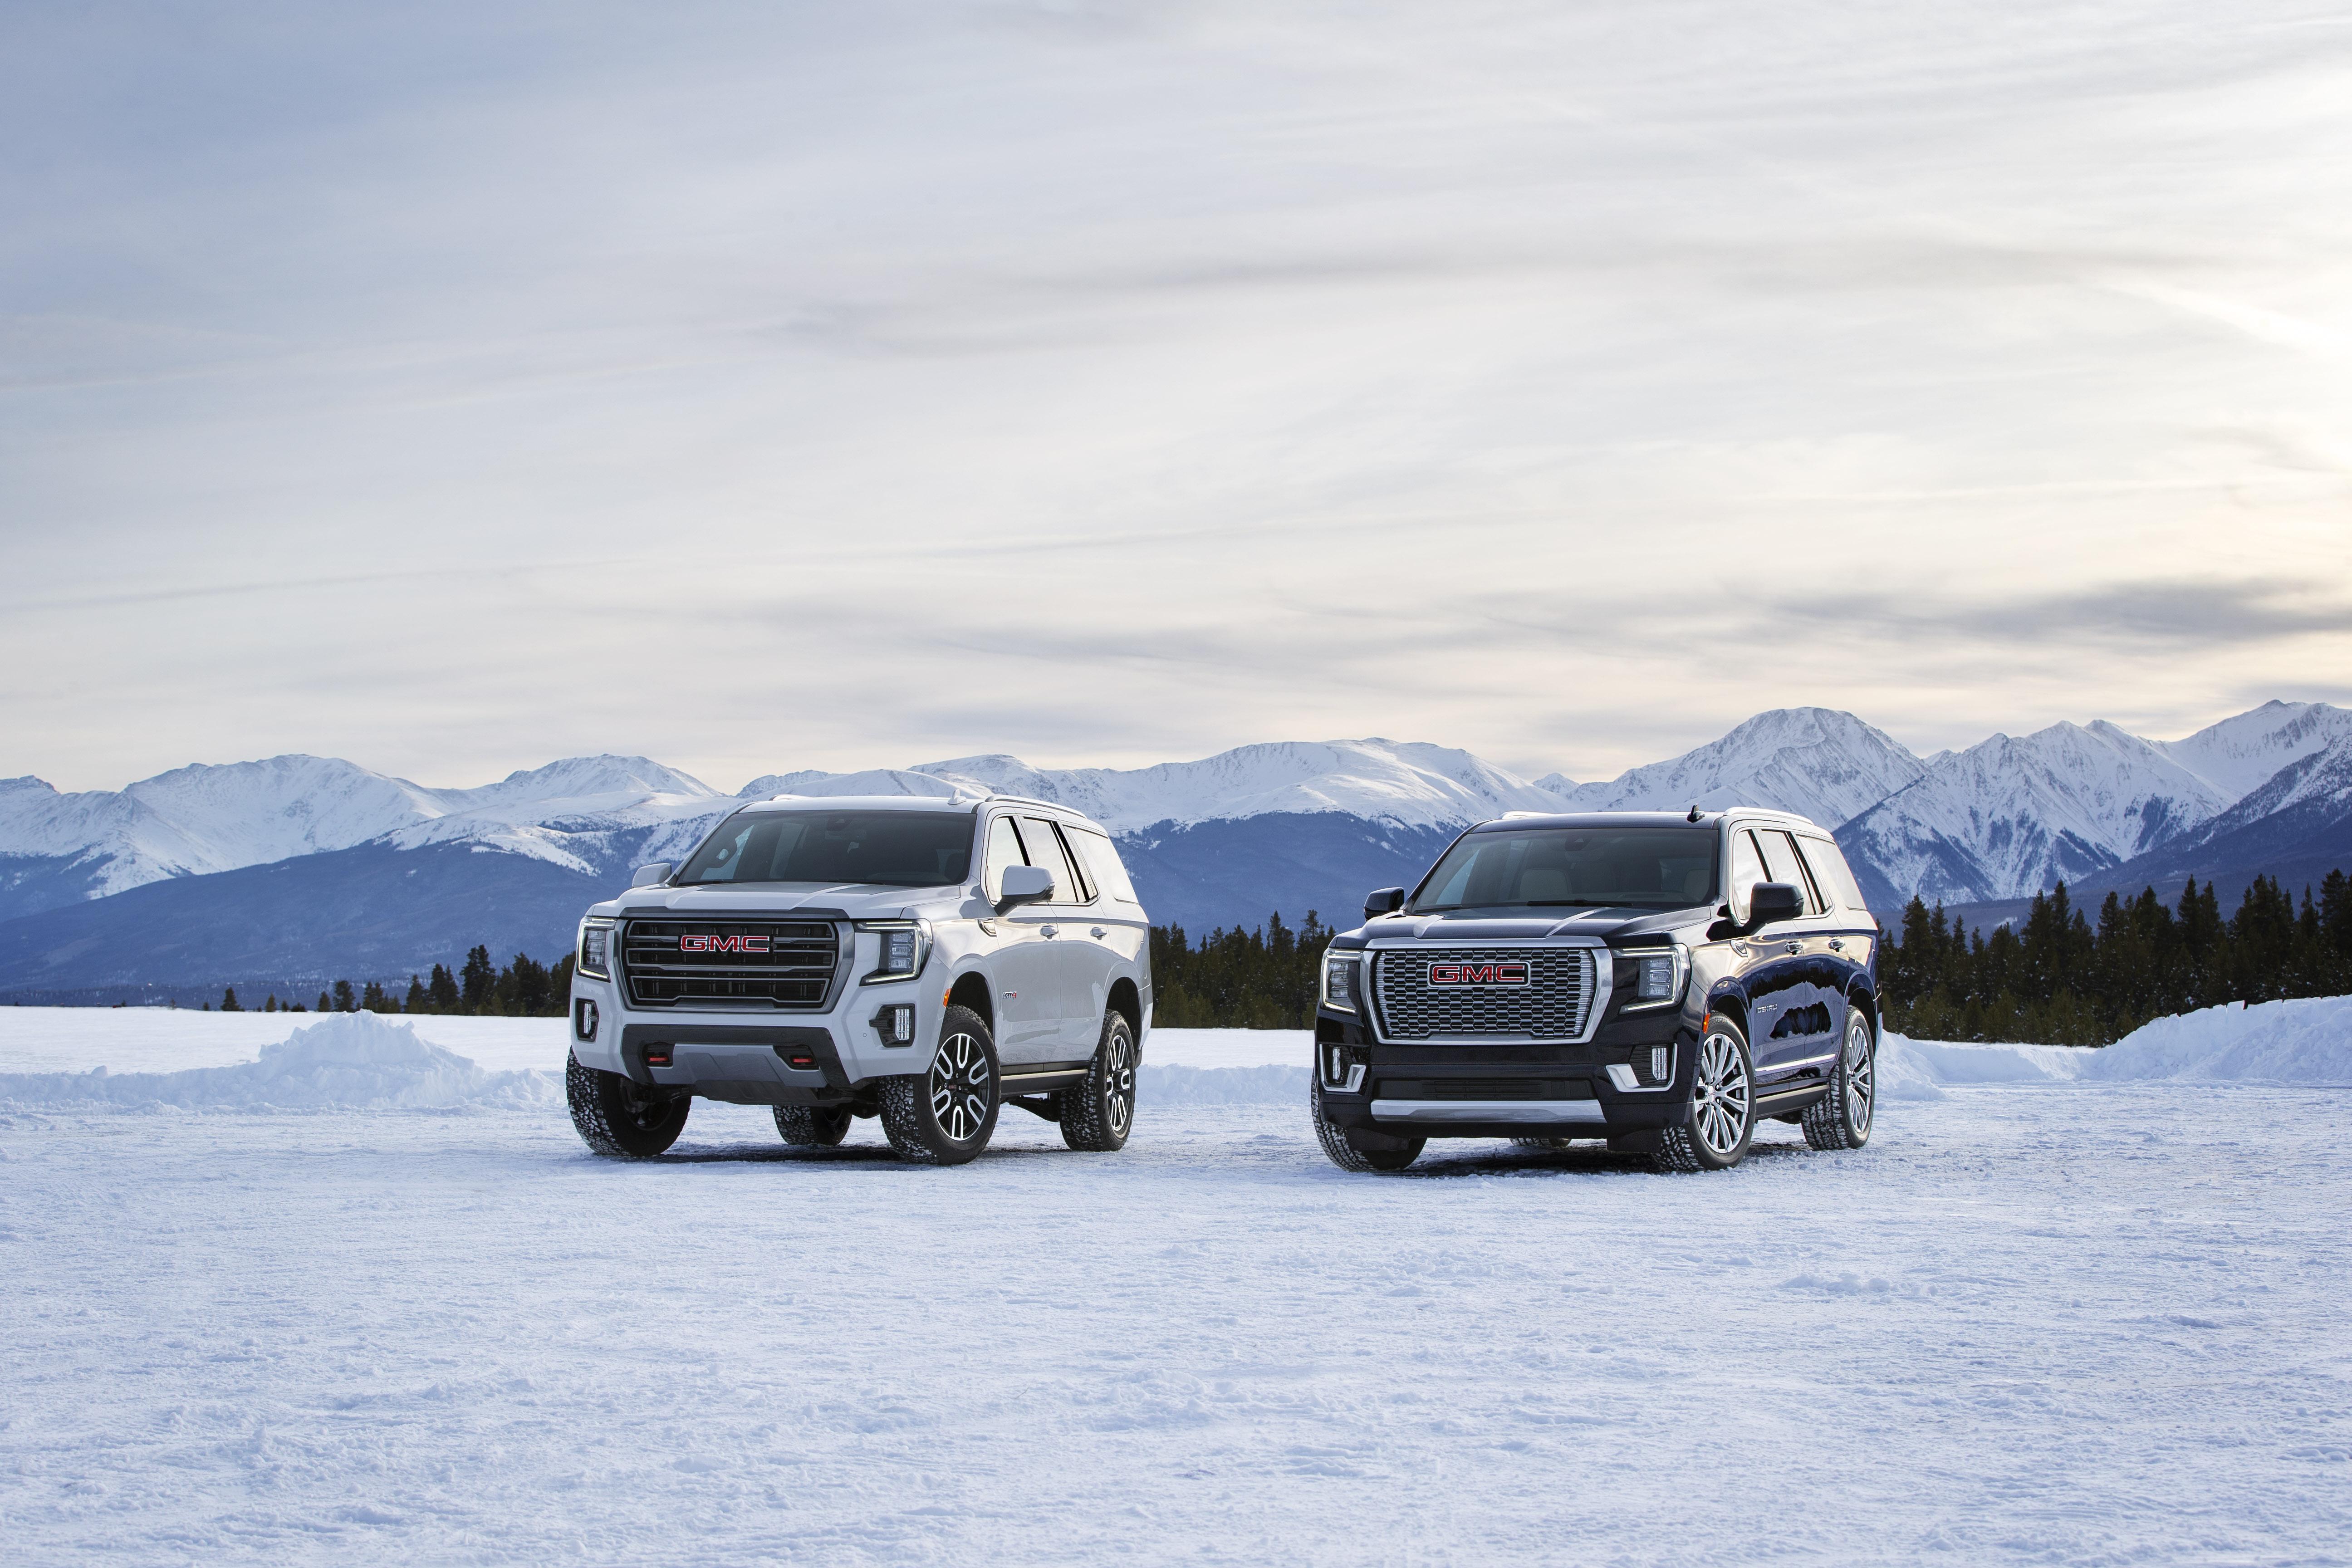 Gmc Reveals The Next Generation Yukon And Yukon Xl